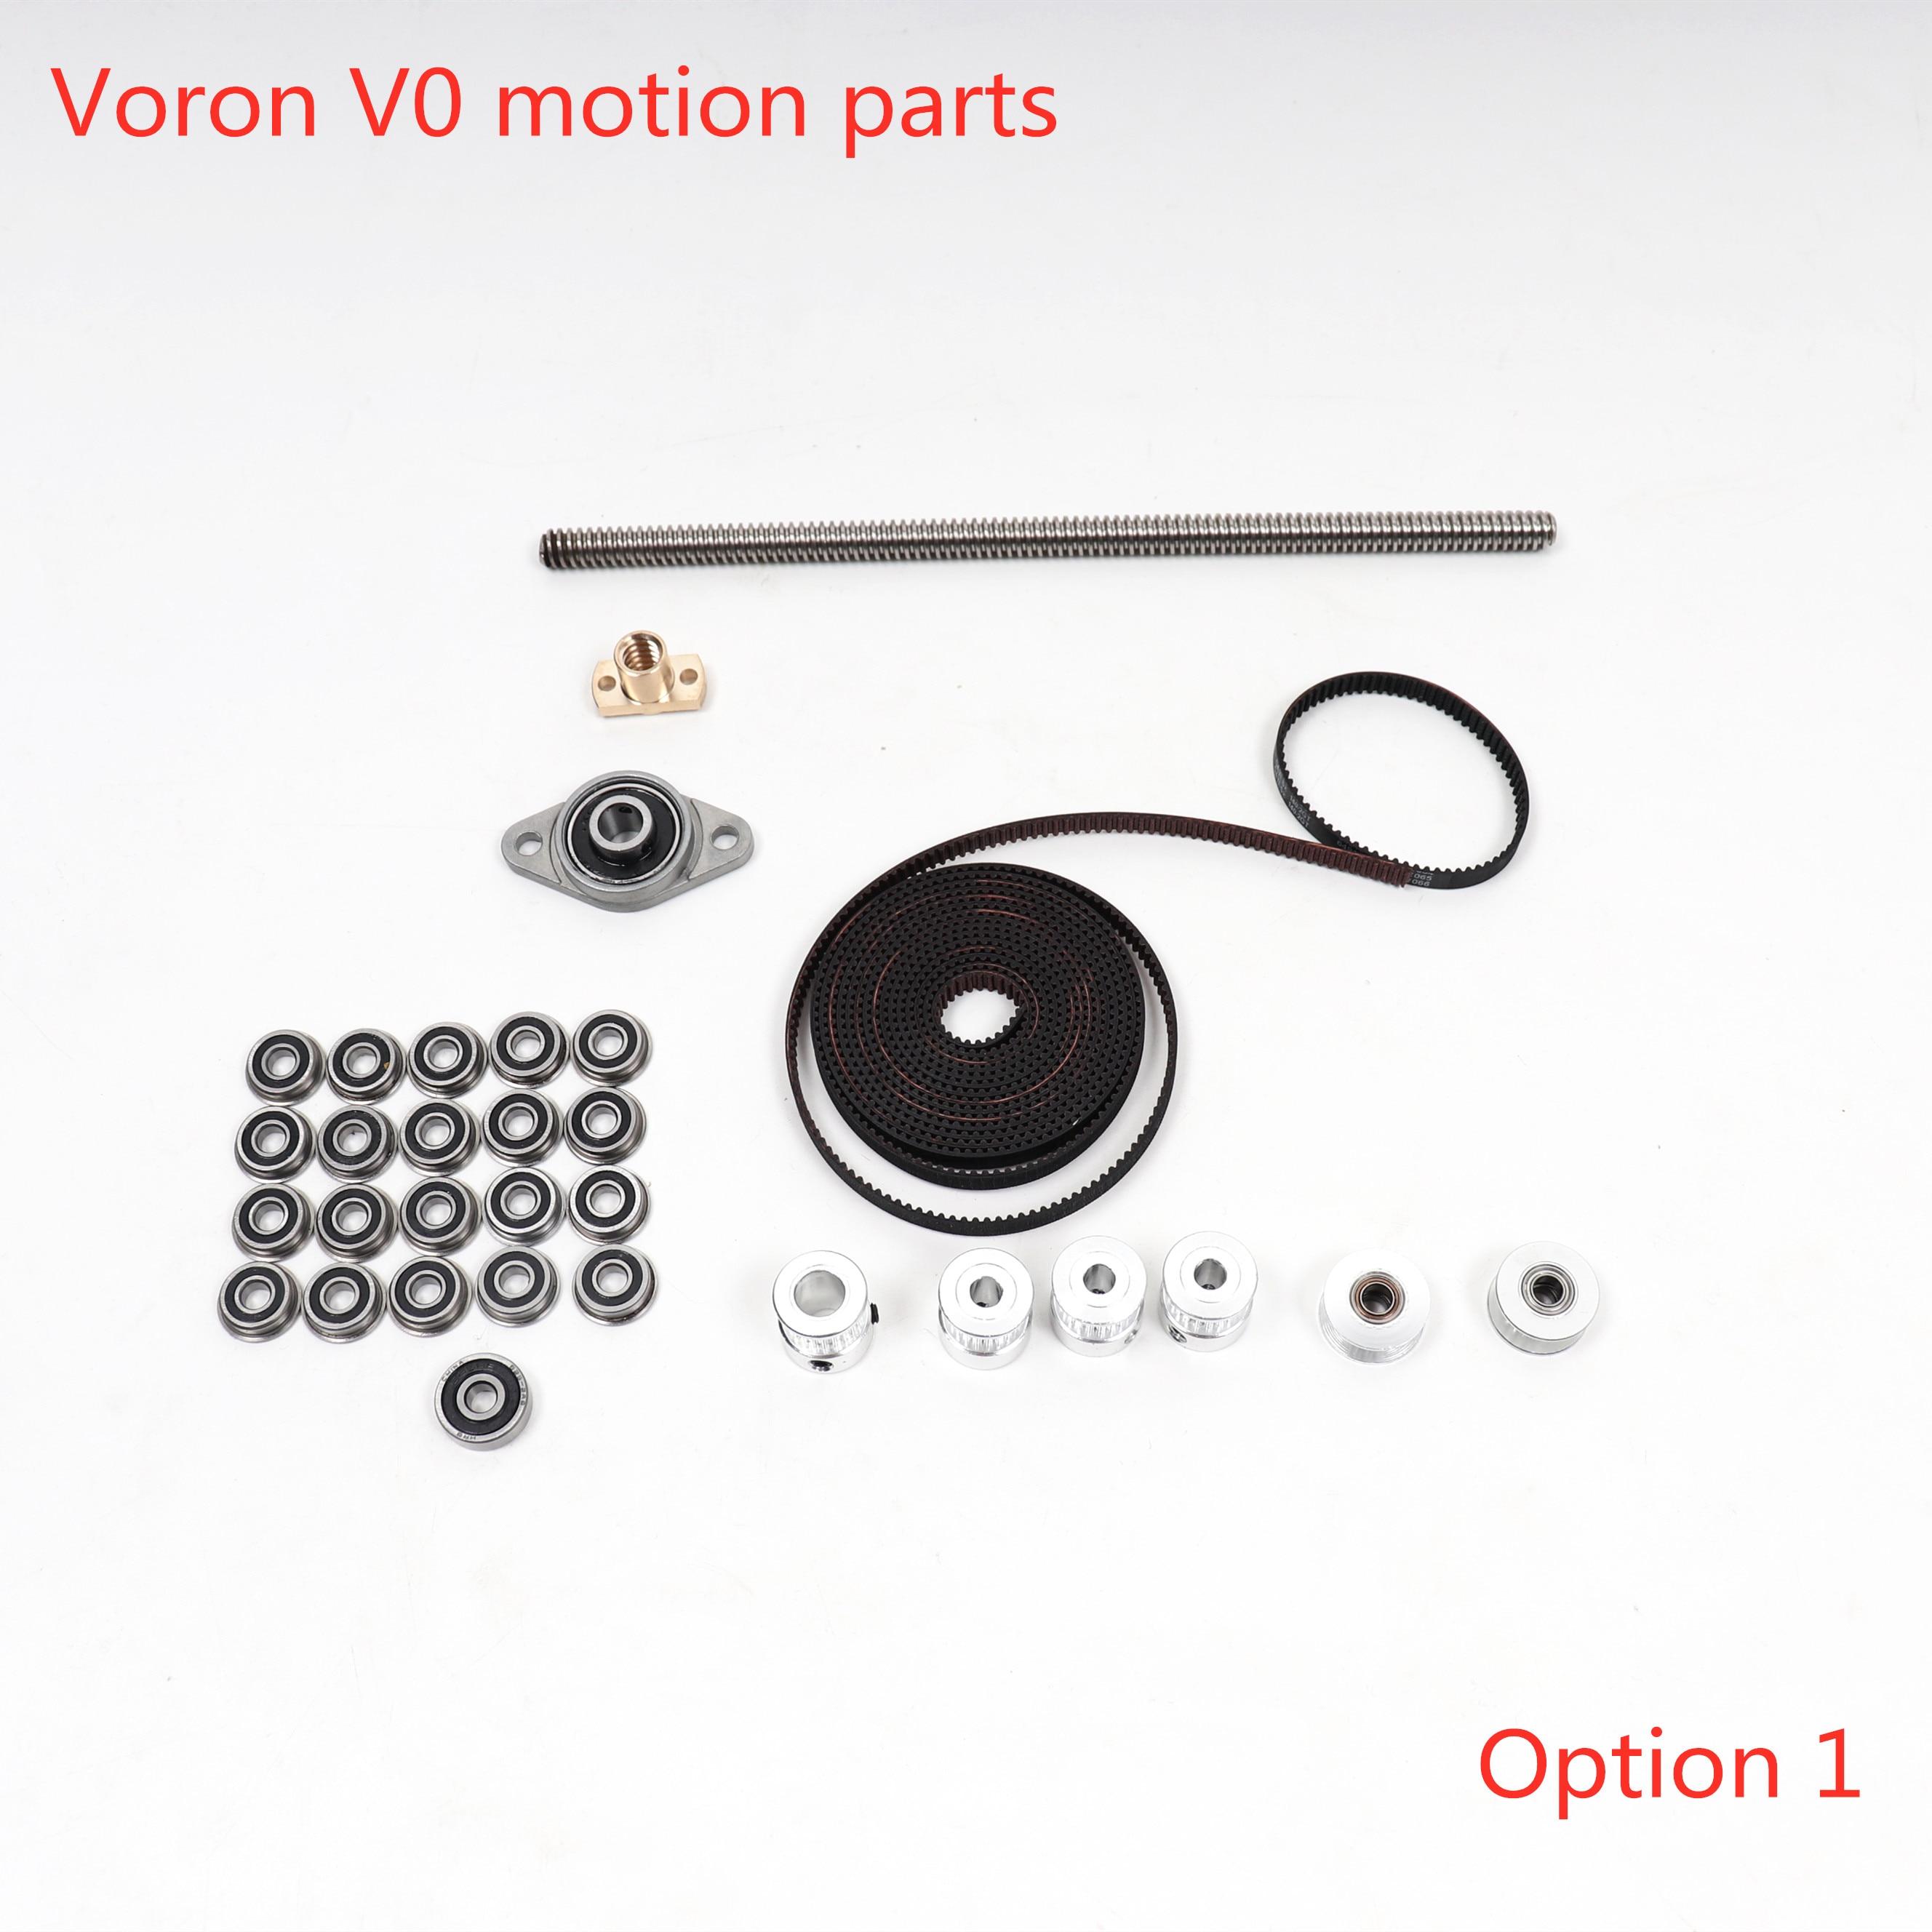 Blurolls Voron V0  3d Printer Motion Parts Gates Belt Lead Screws GT2 20T Pulleys Idlers Bearings,Hiwin MGN7H Rails Optional